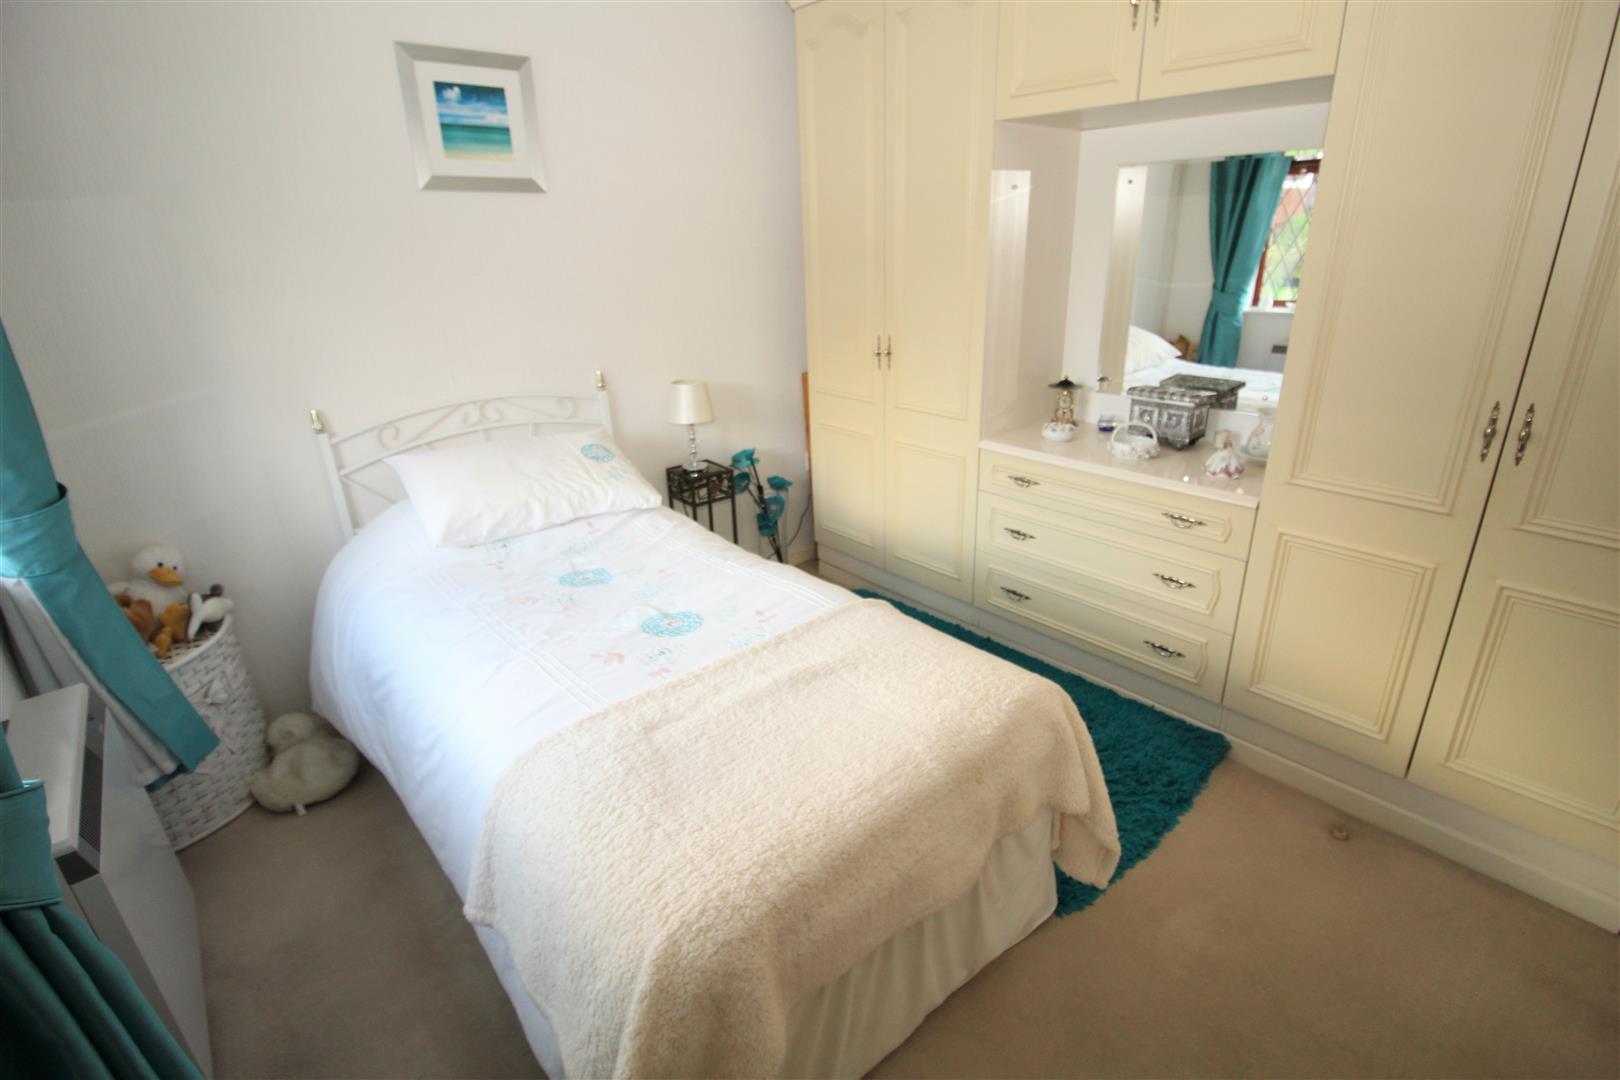 2 Bedrooms, Bungalow - Detached, Windsor Close, Bootle